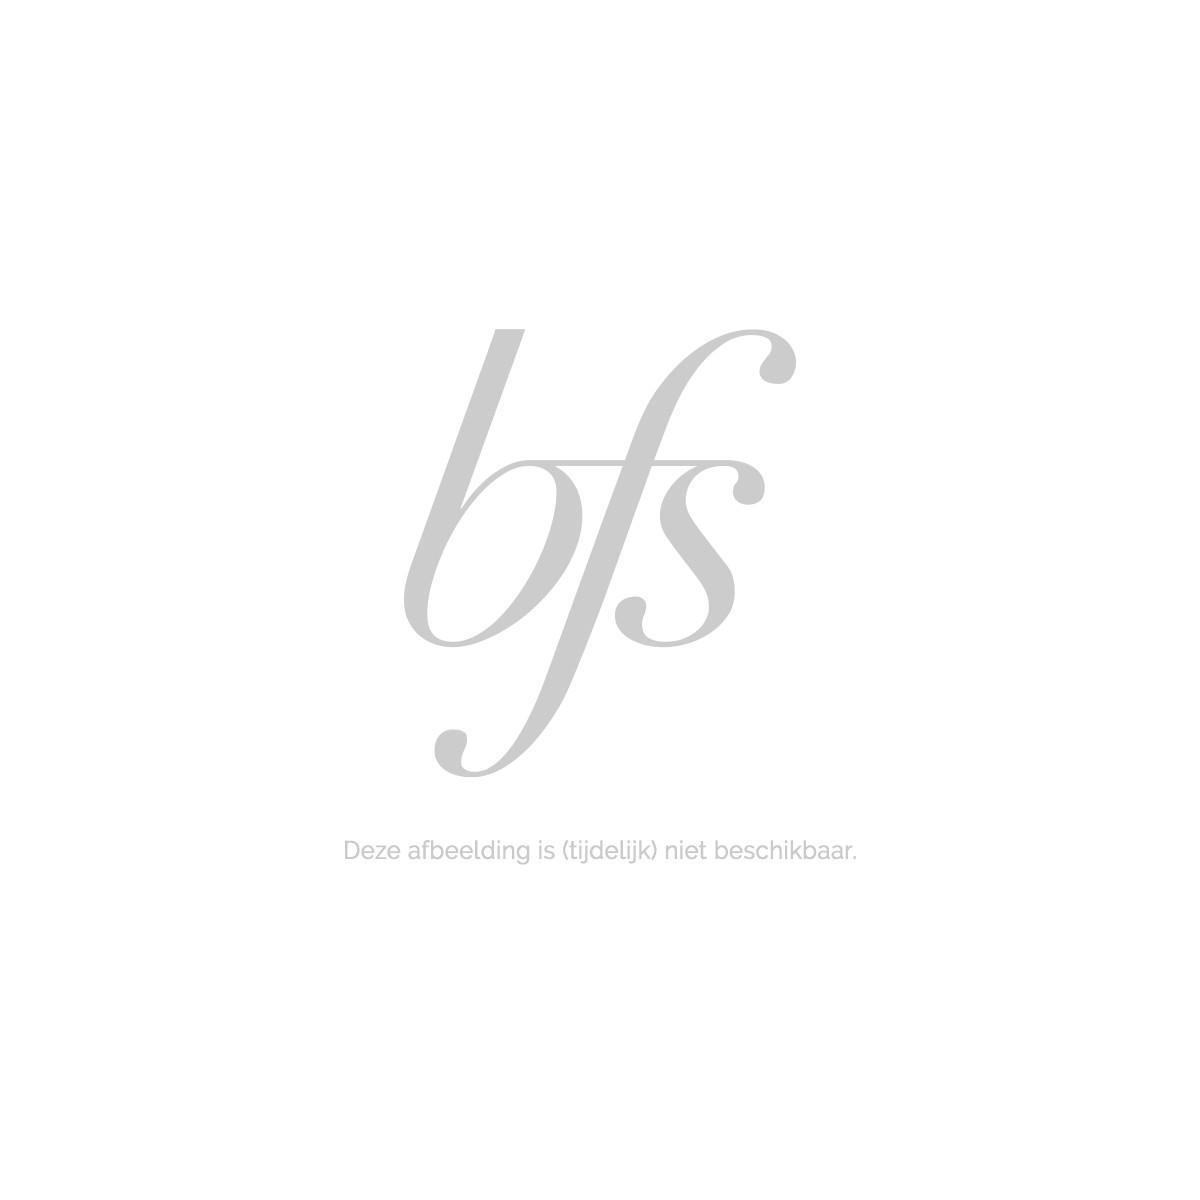 Givenchy Gentleman Eau De Toilette Spray (1) 100 Ml